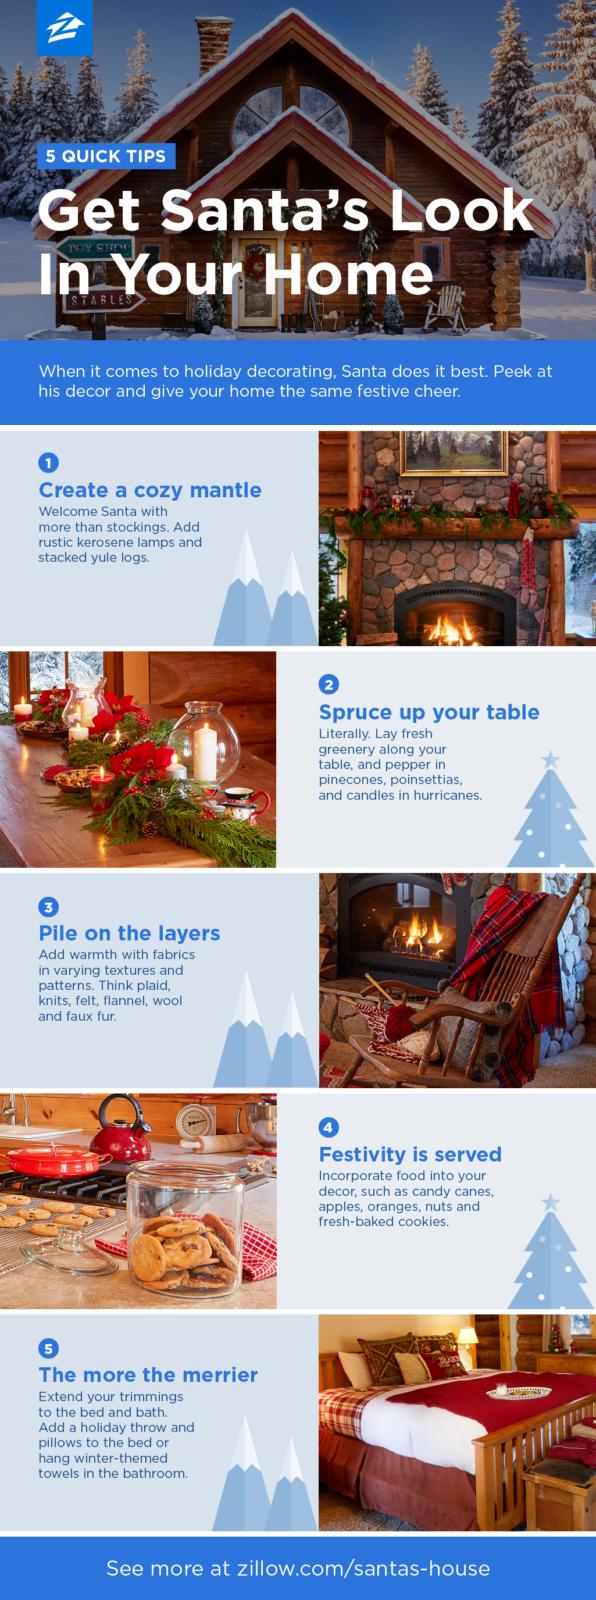 Get Santa's Look In Your Home